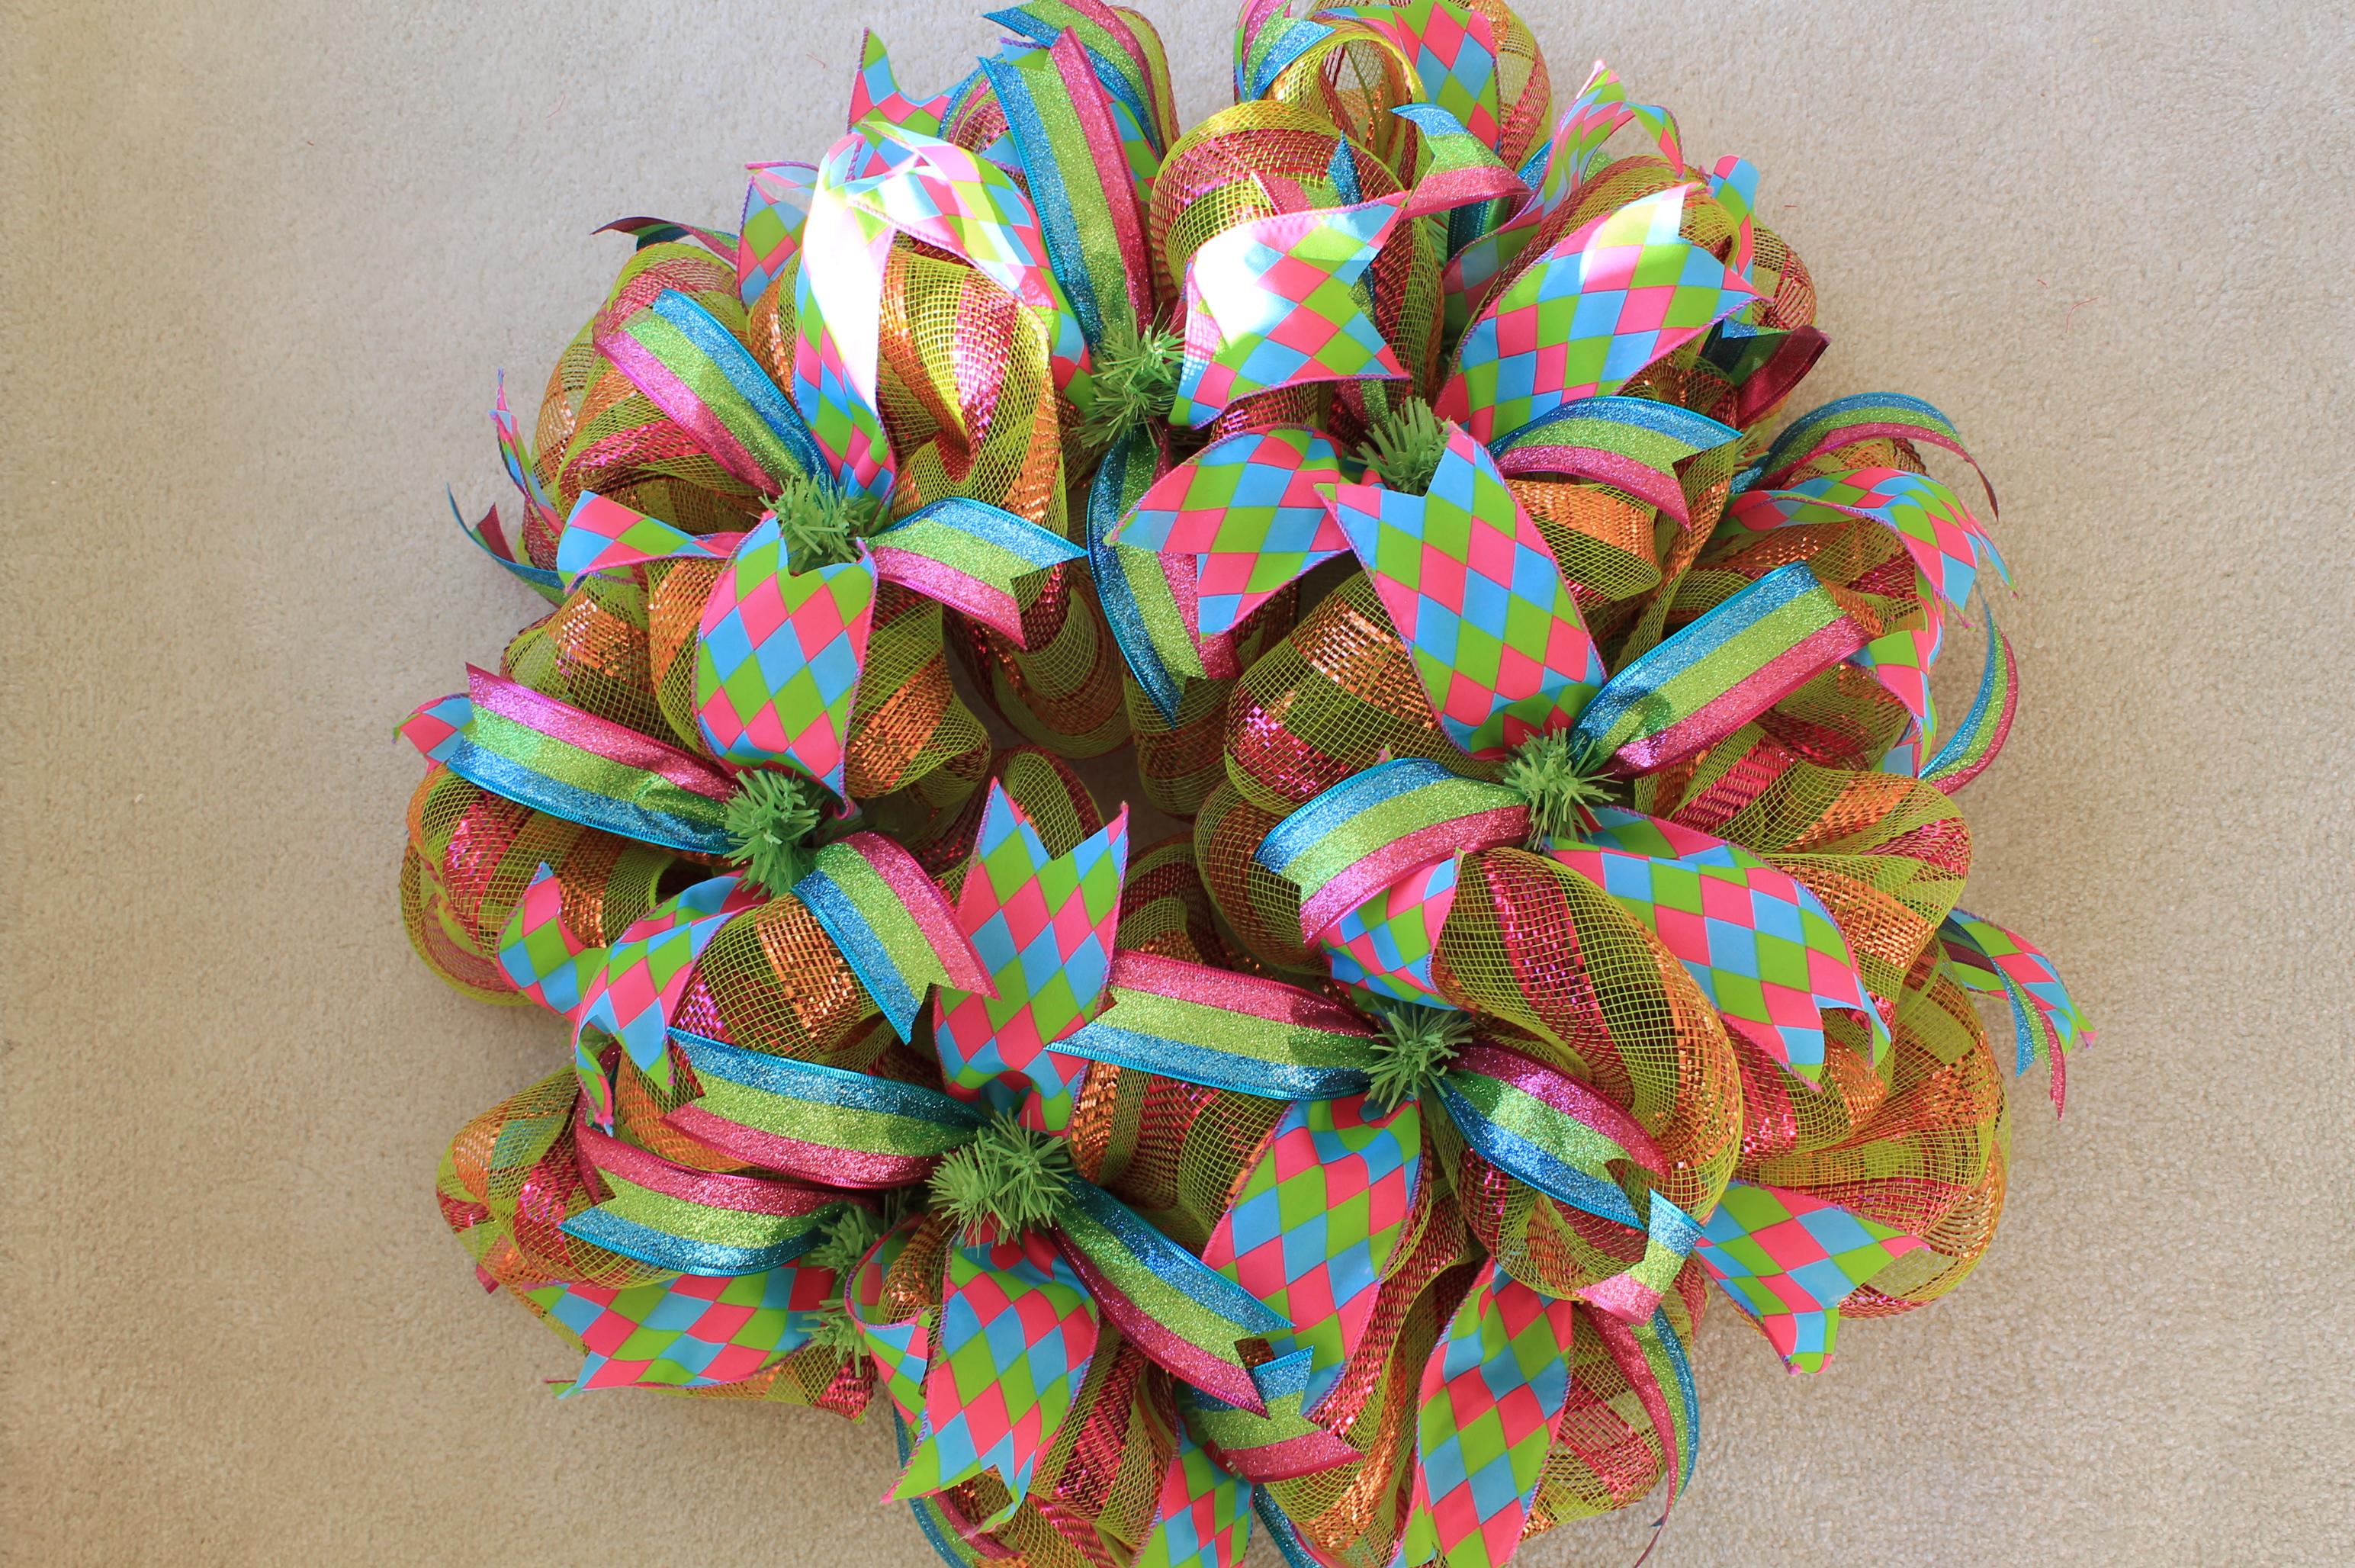 Diy Mesh Quot Mardi Gras Quot Wreath The Wreath Depot